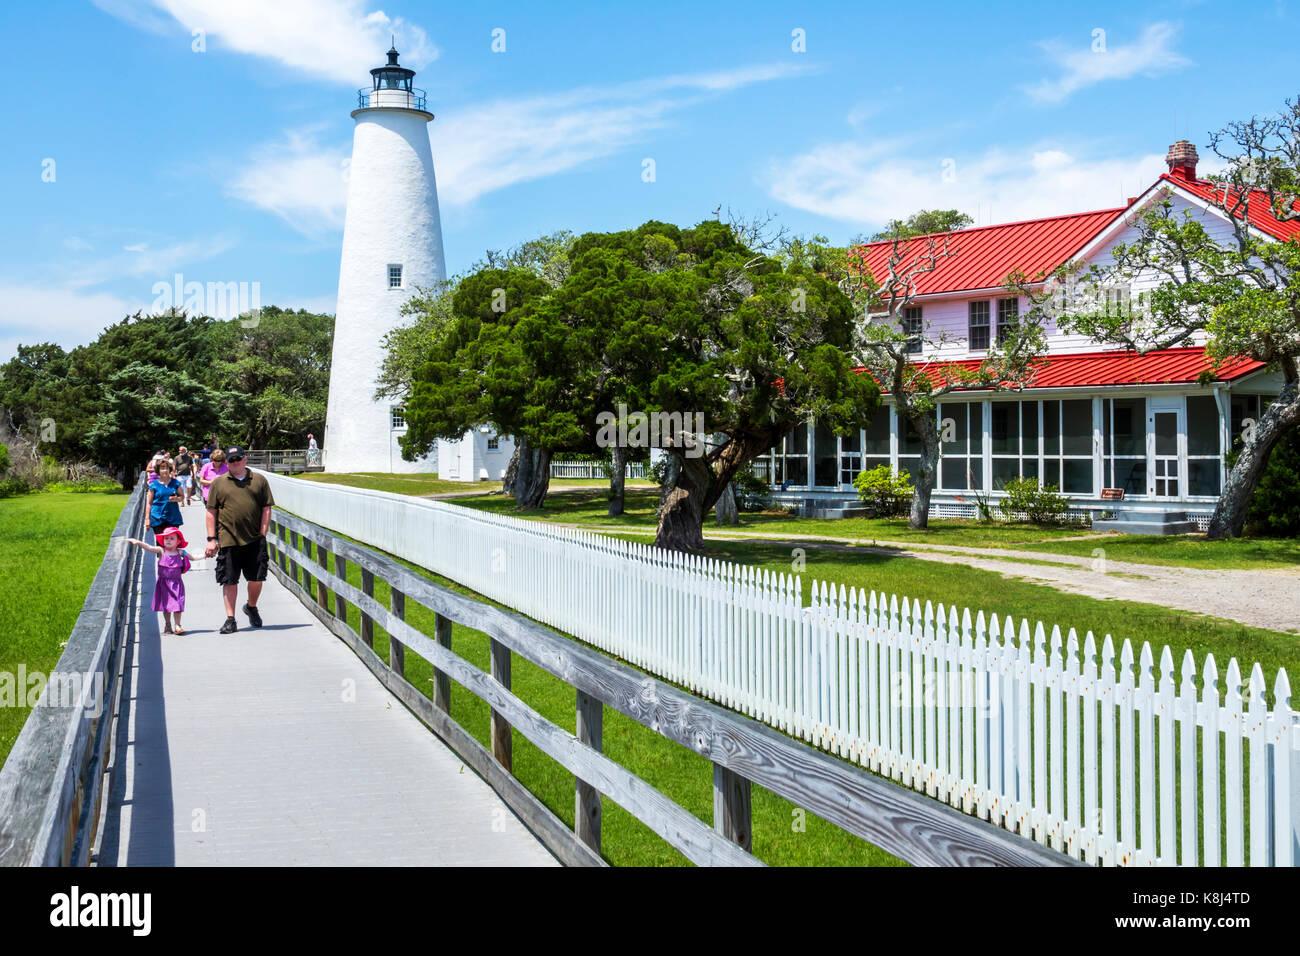 Outer Banks North Carolina NC Ocracoke Island Ocracoke Light lighthouse station boardwalk - Stock Image